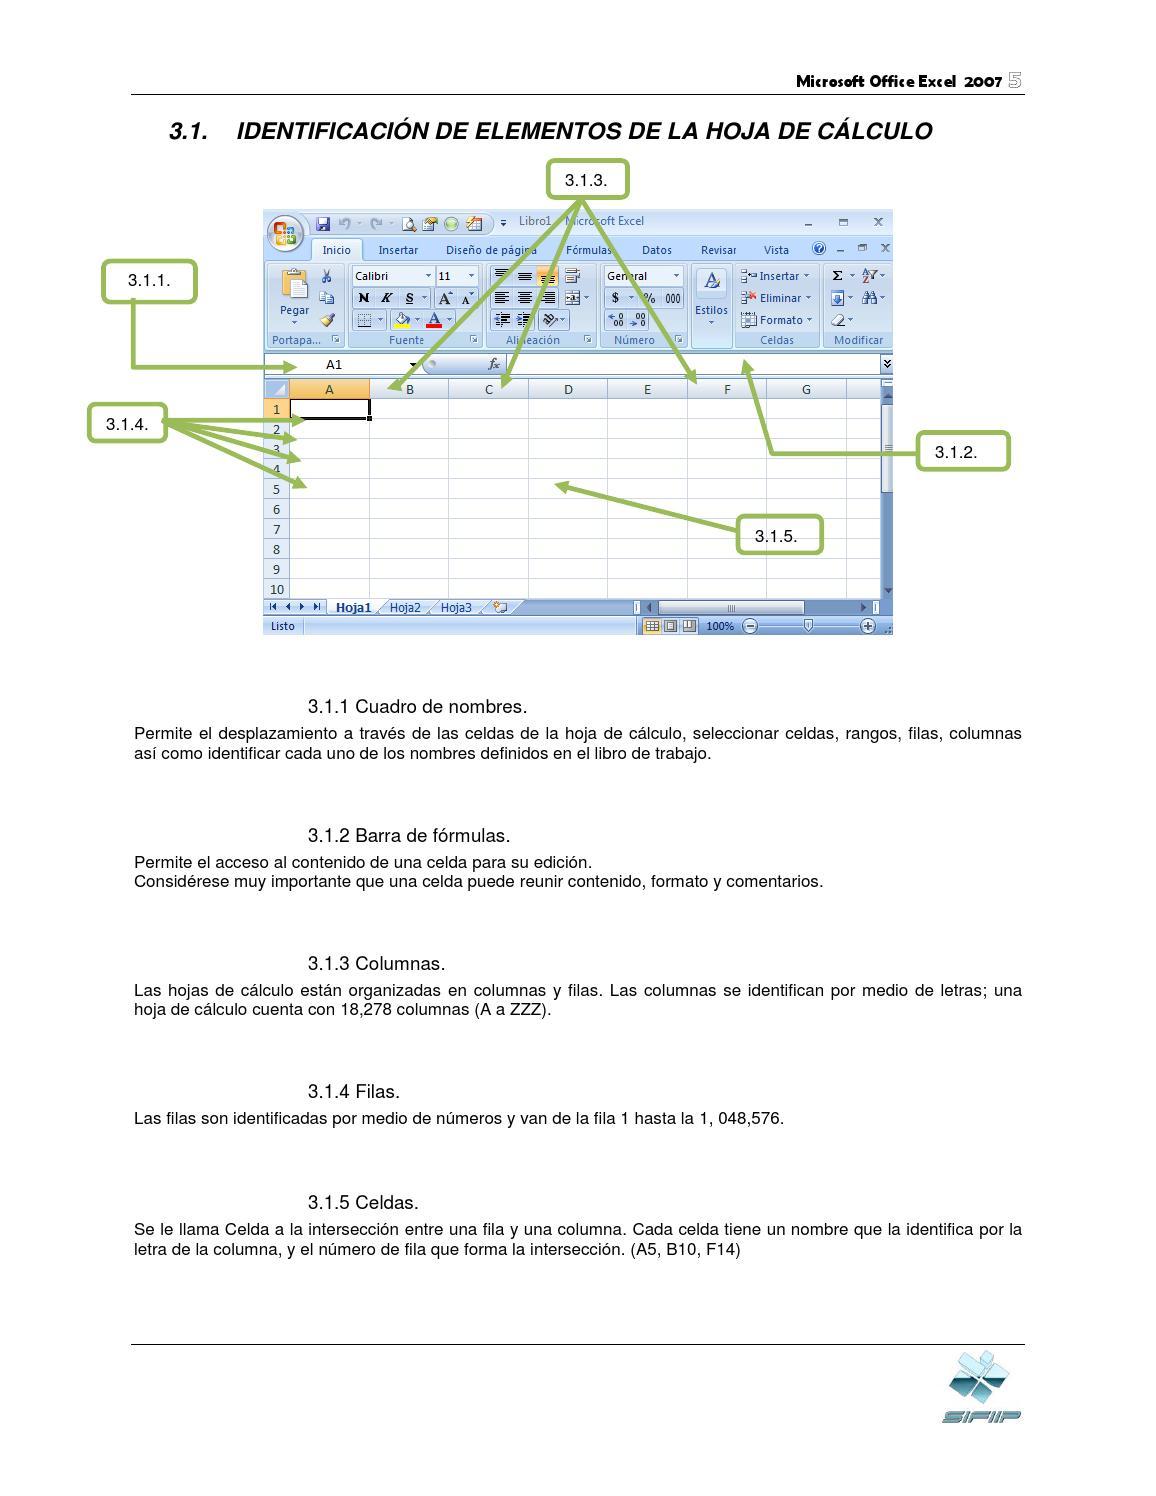 Excel identificacion elem hoja calculo by Jimena jocelin - issuu